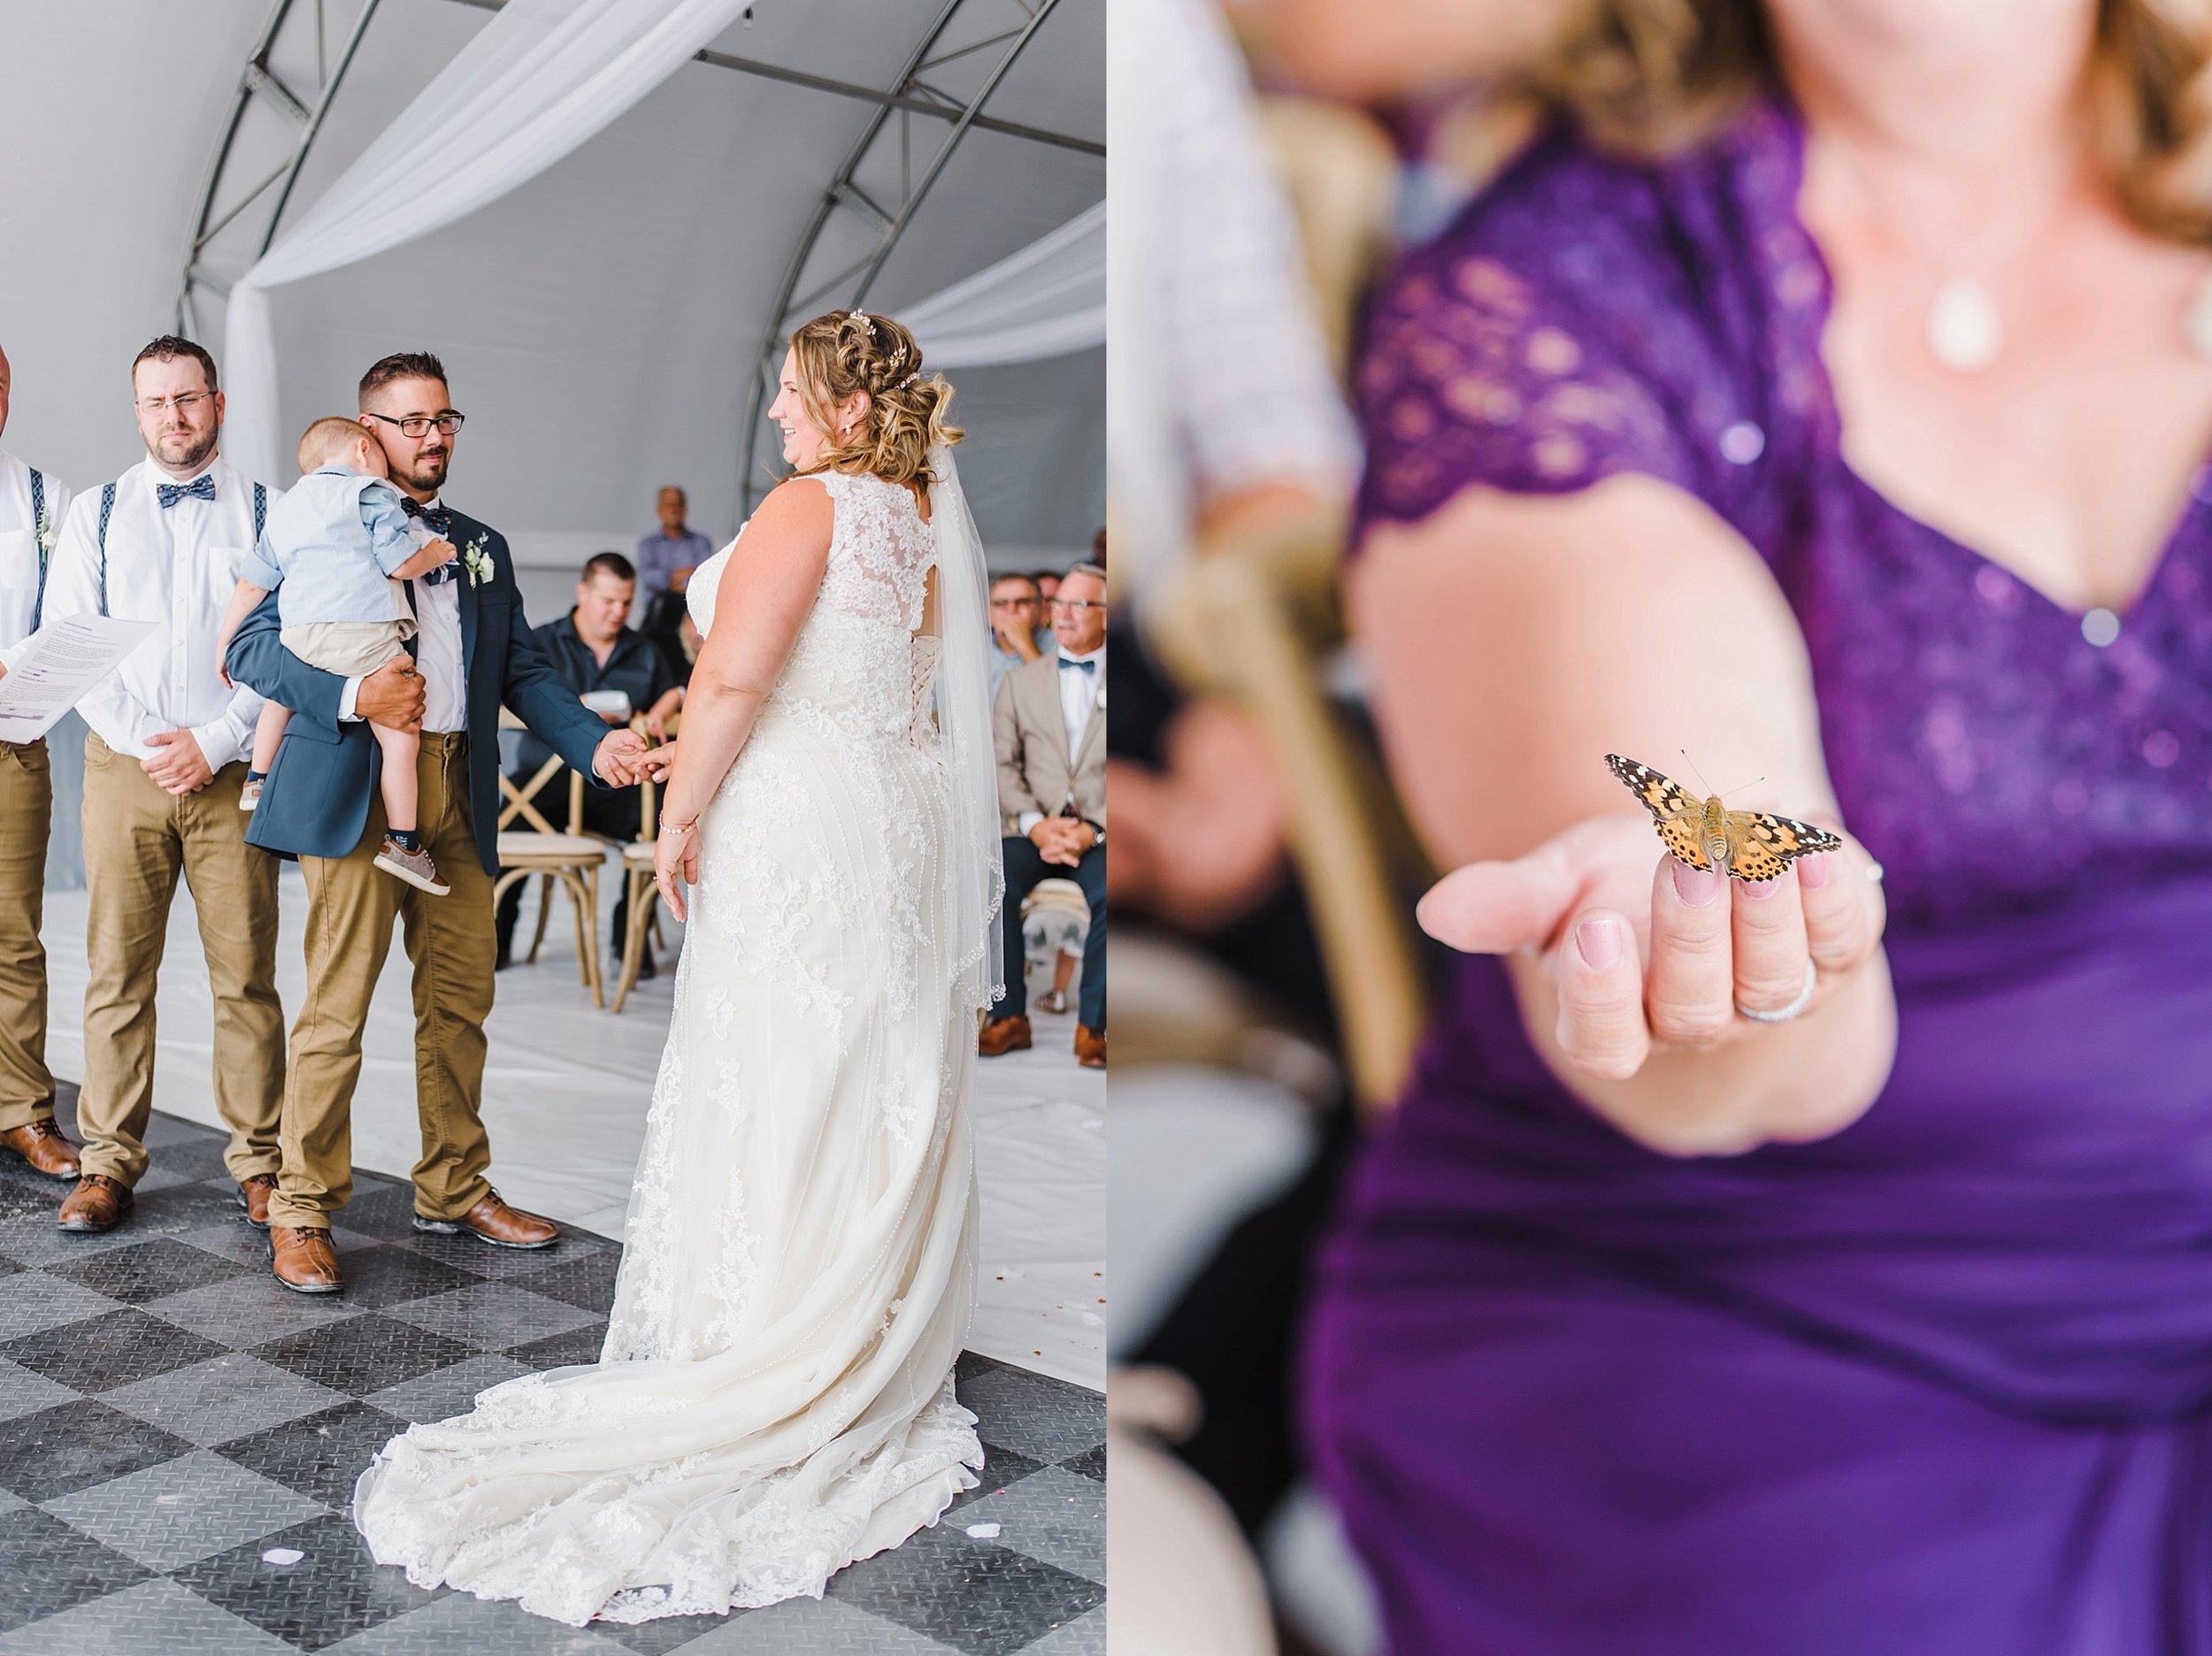 light airy indie fine art ottawa wedding photographer | Ali and Batoul Photography_0363.jpg